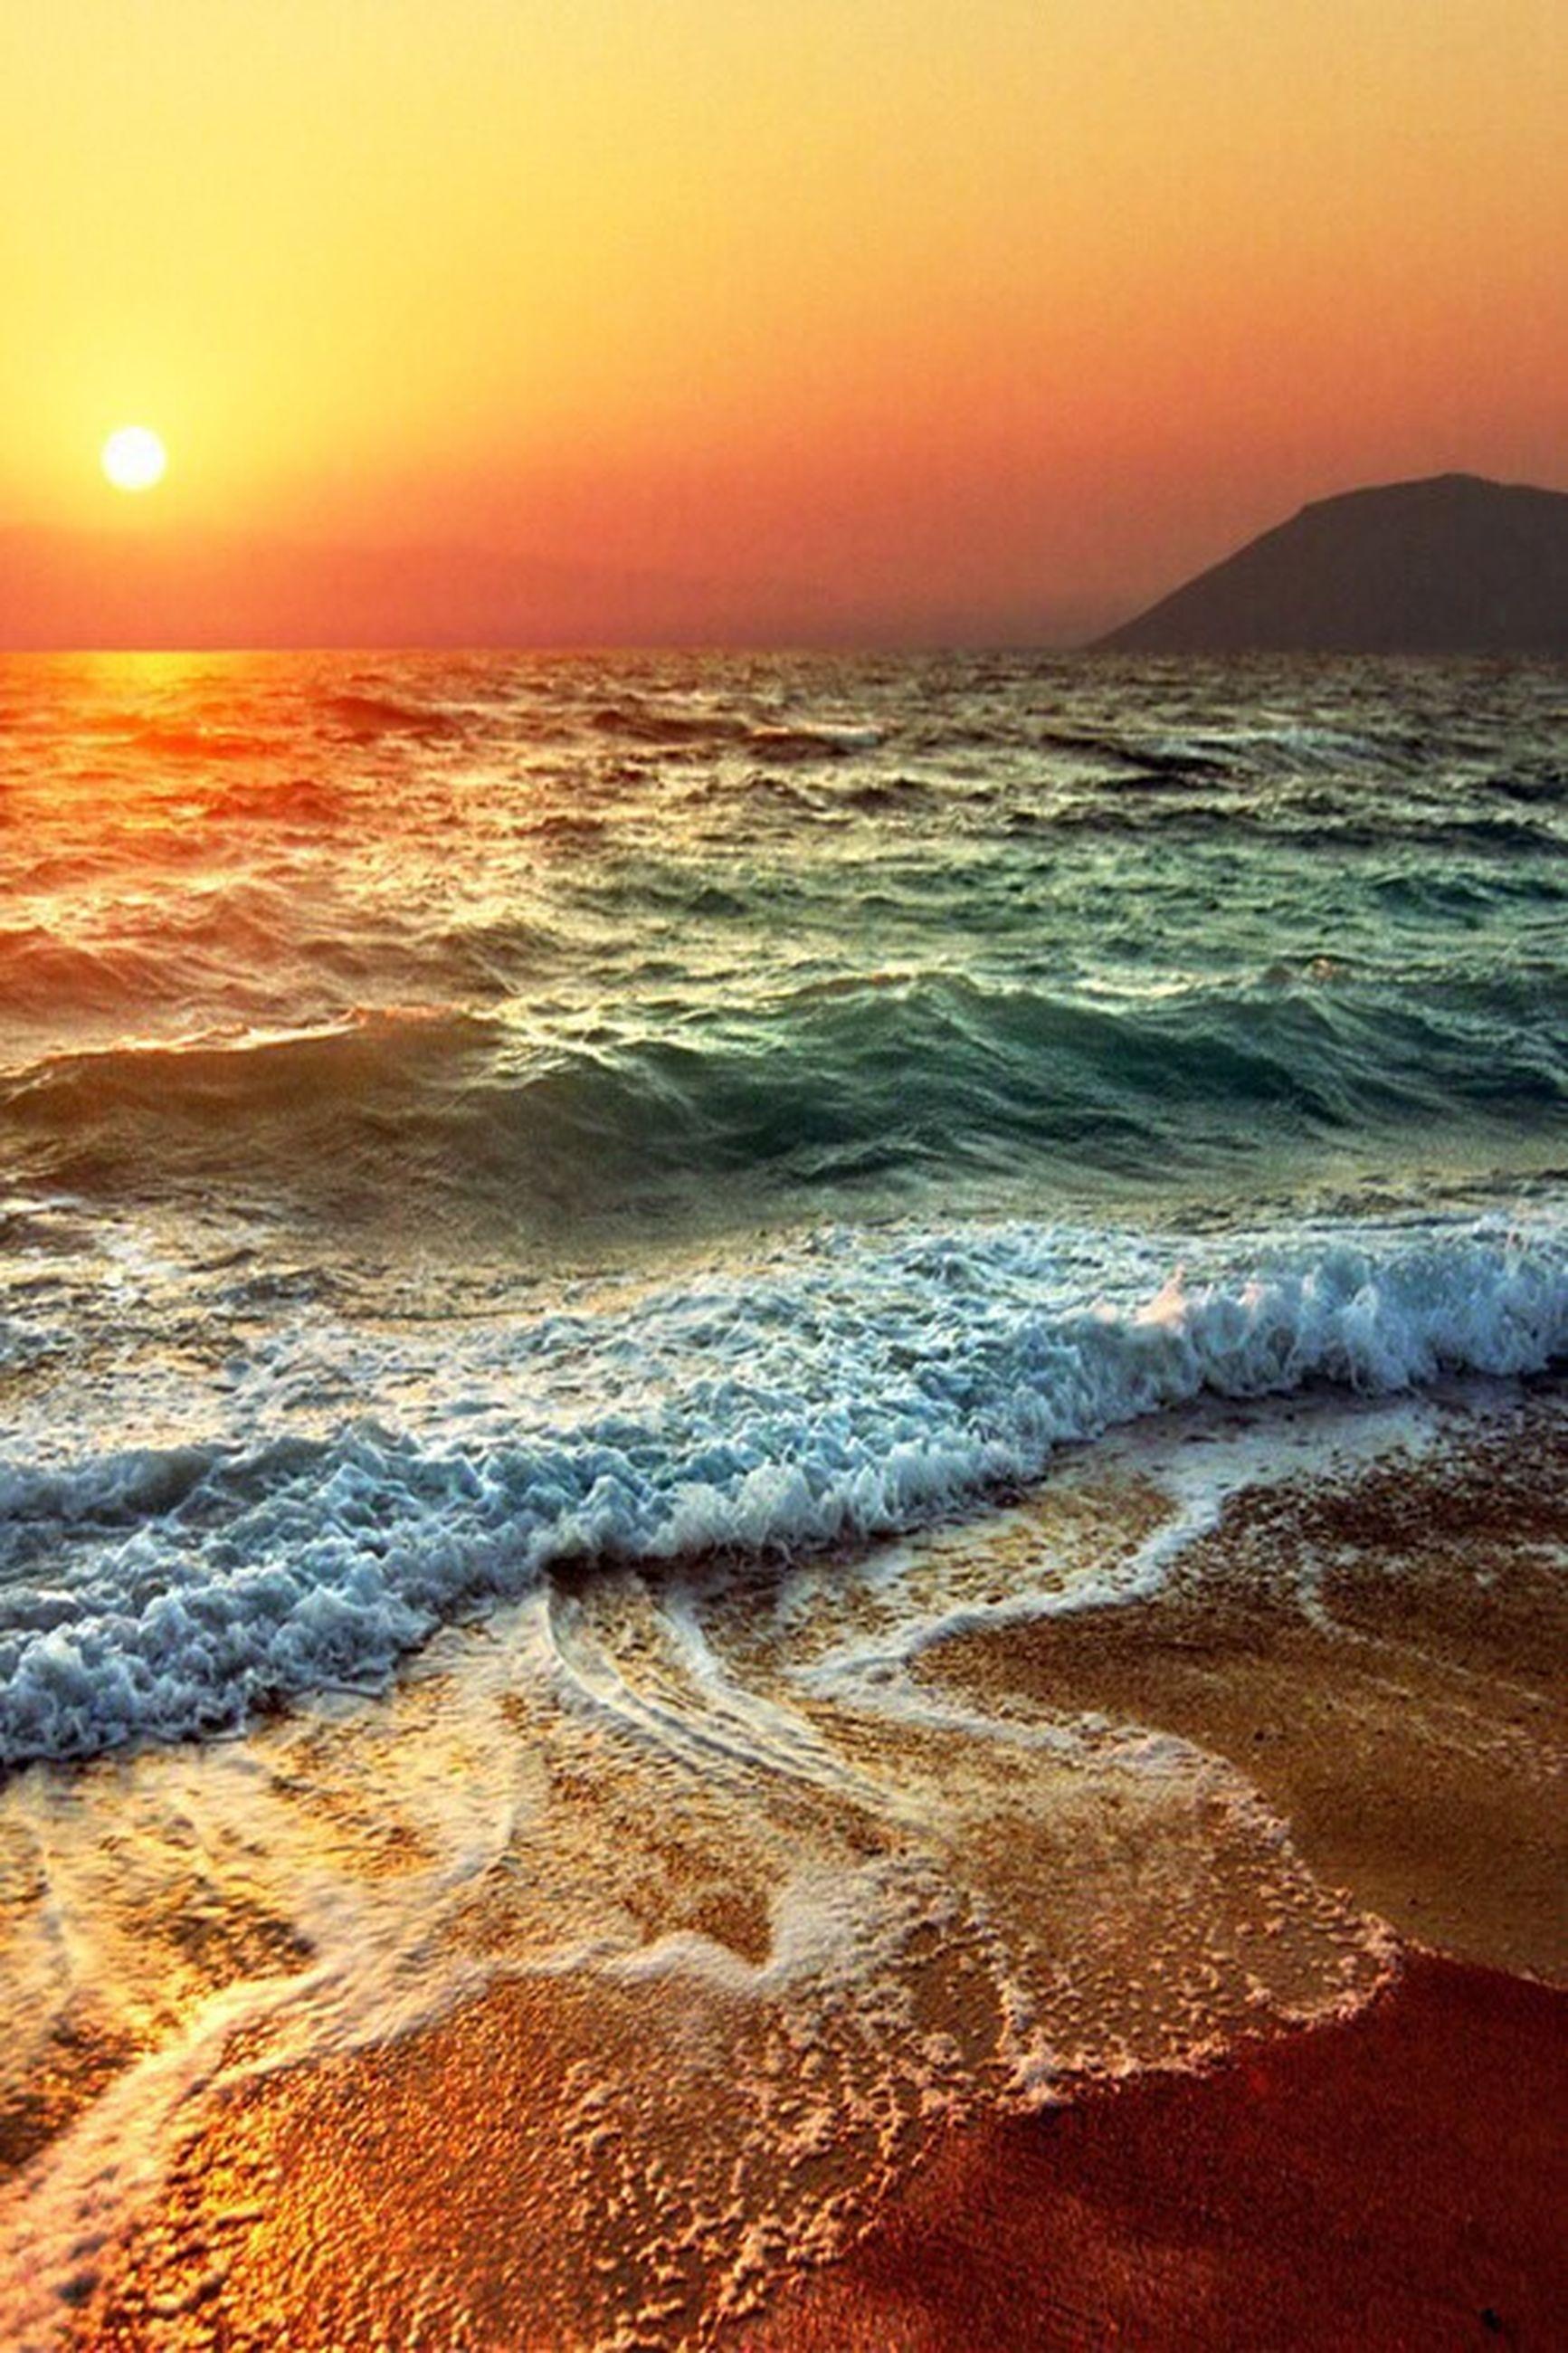 sea, sunset, water, beach, scenics, beauty in nature, wave, horizon over water, tranquil scene, orange color, shore, tranquility, sun, surf, idyllic, nature, sky, tide, sand, coastline